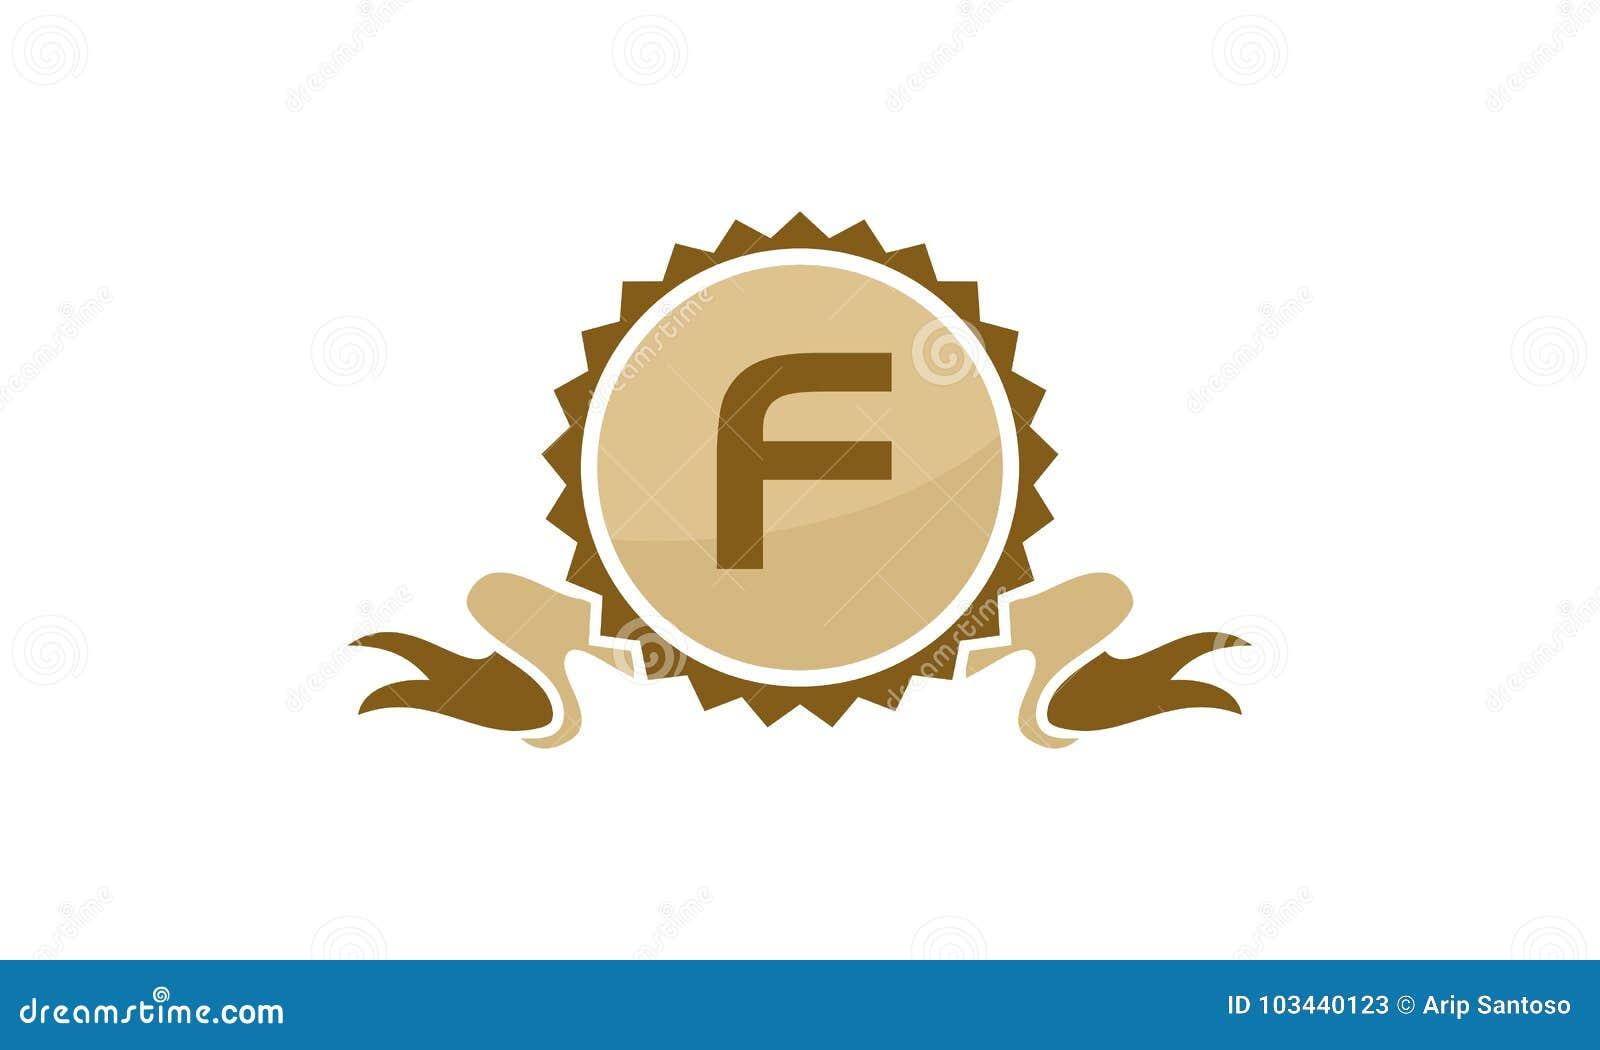 3a5dfbf436 Best Quality Ribbon Letter F Stock Vector - Illustration of customer ...